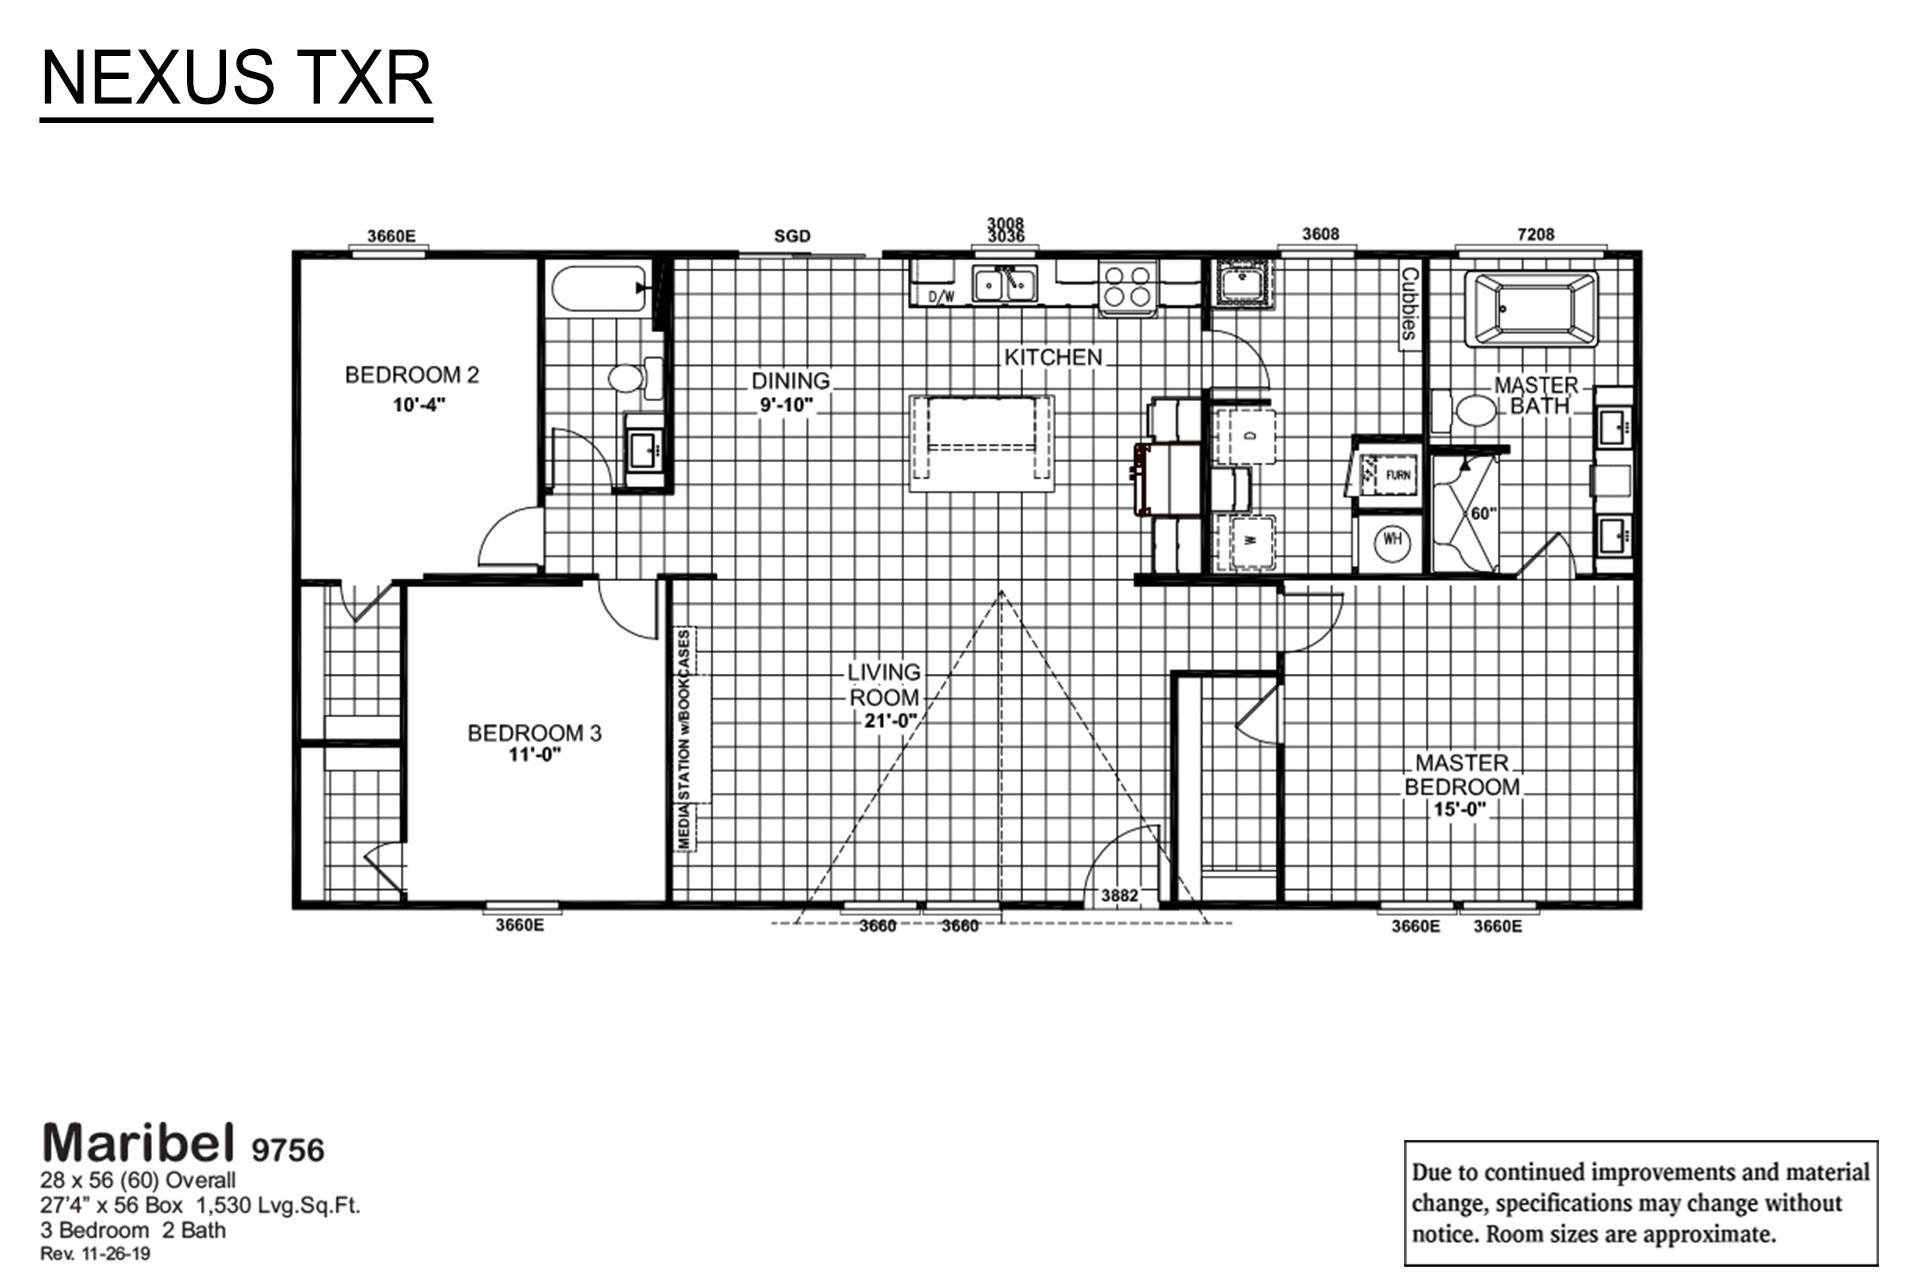 Nexus TXR - Maribel 9756